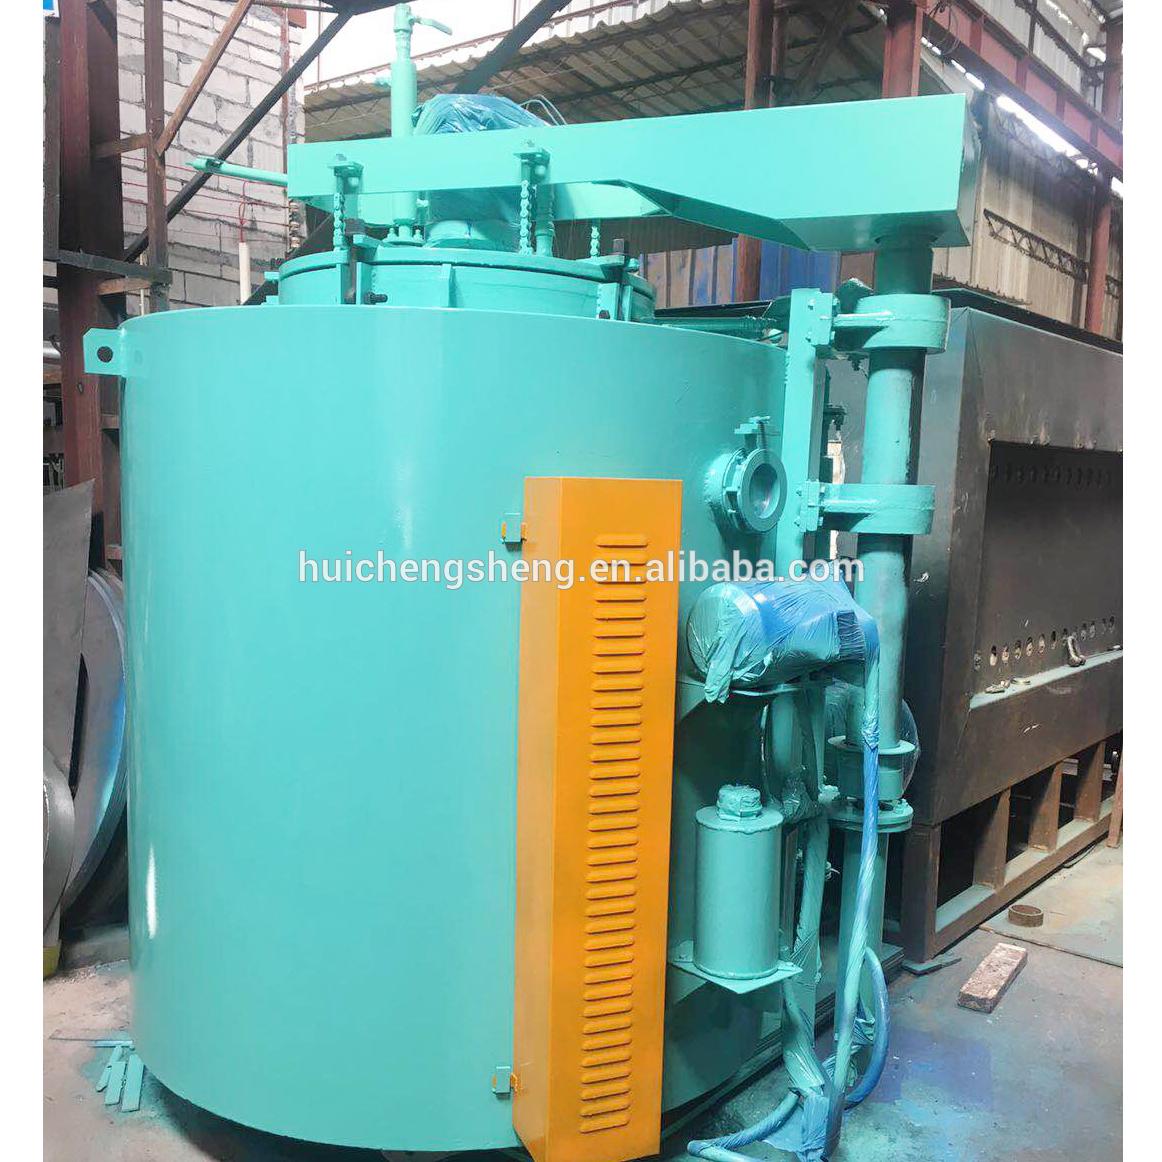 Industrial Pit / Well Type Heat Treatment Die Steel Vacuum Gas Nitriding Furnace